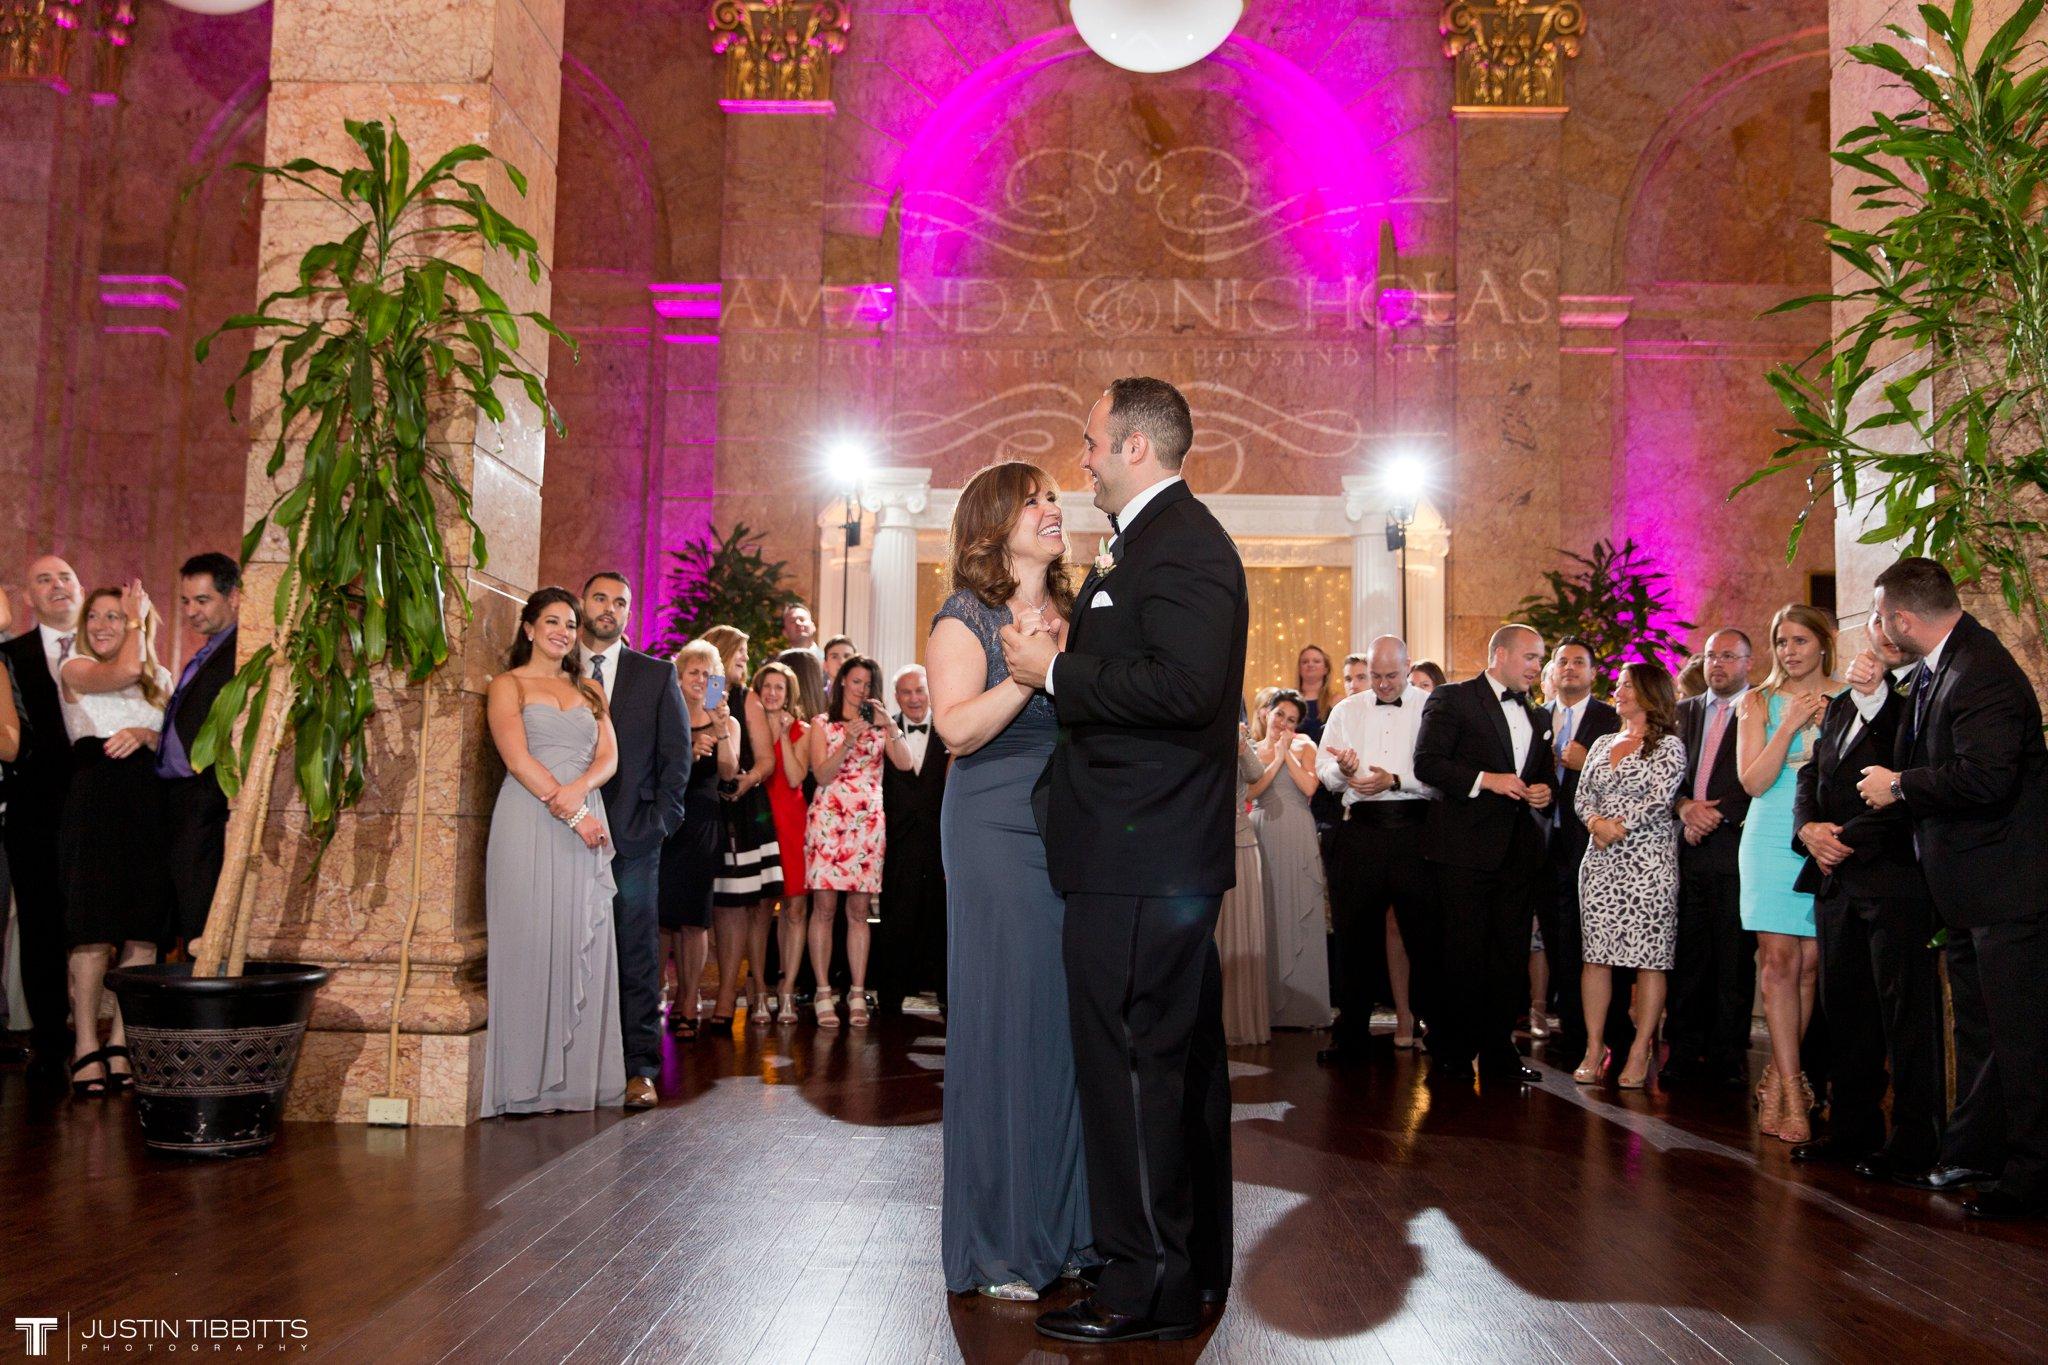 state-room-wedding-photos-with-amanda-and-nick_0163